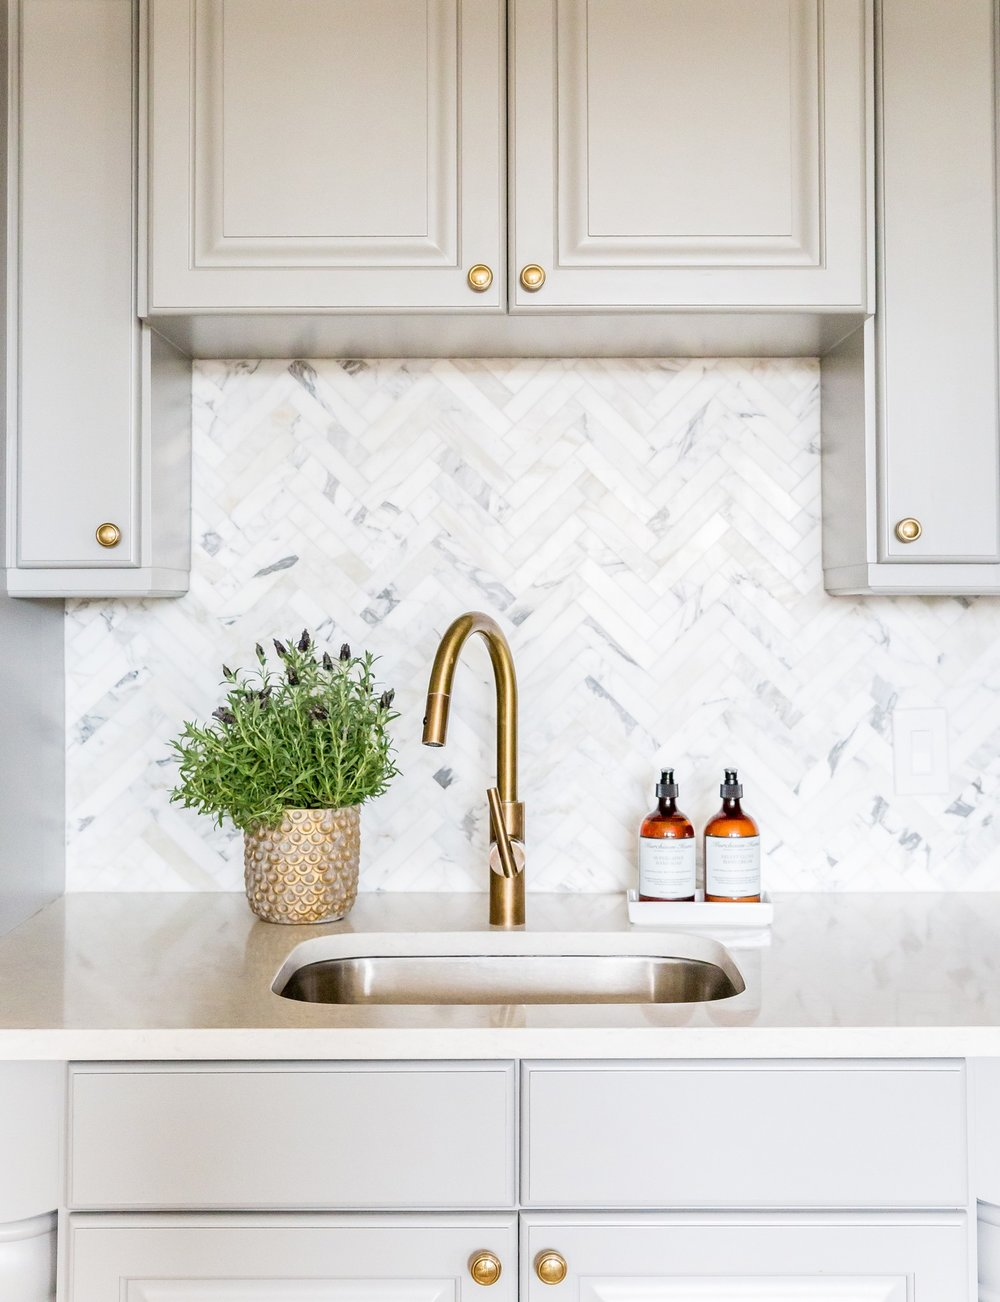 Benjamin Moore Chelsea Gray Cabinets and Marble Herringbone Backsplash || Studio McGee